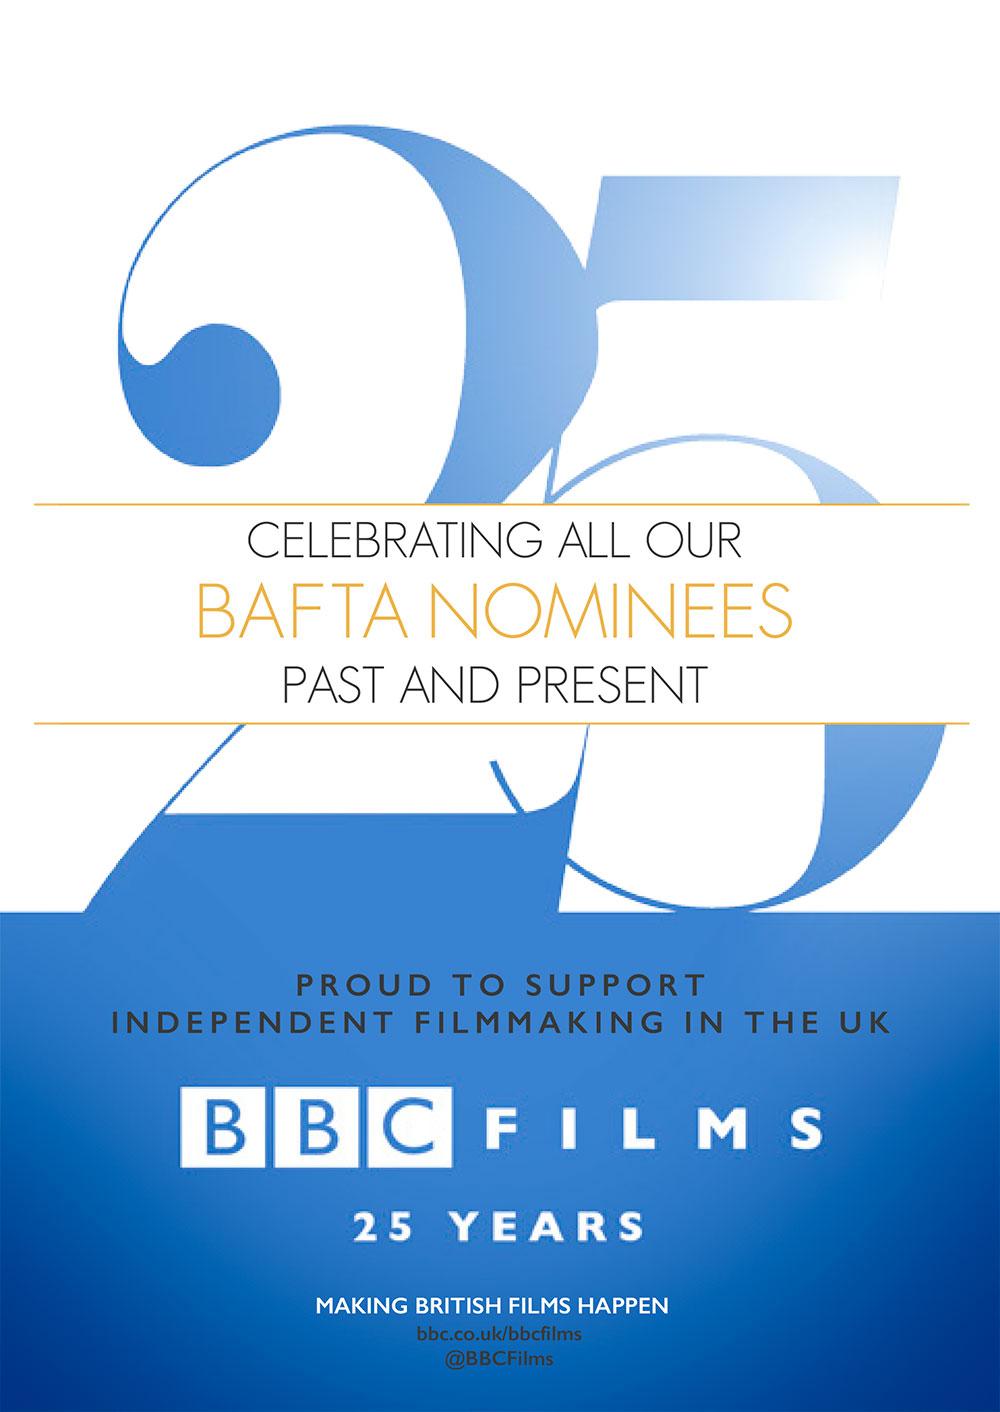 BBC_Films_BAFTAv6-1